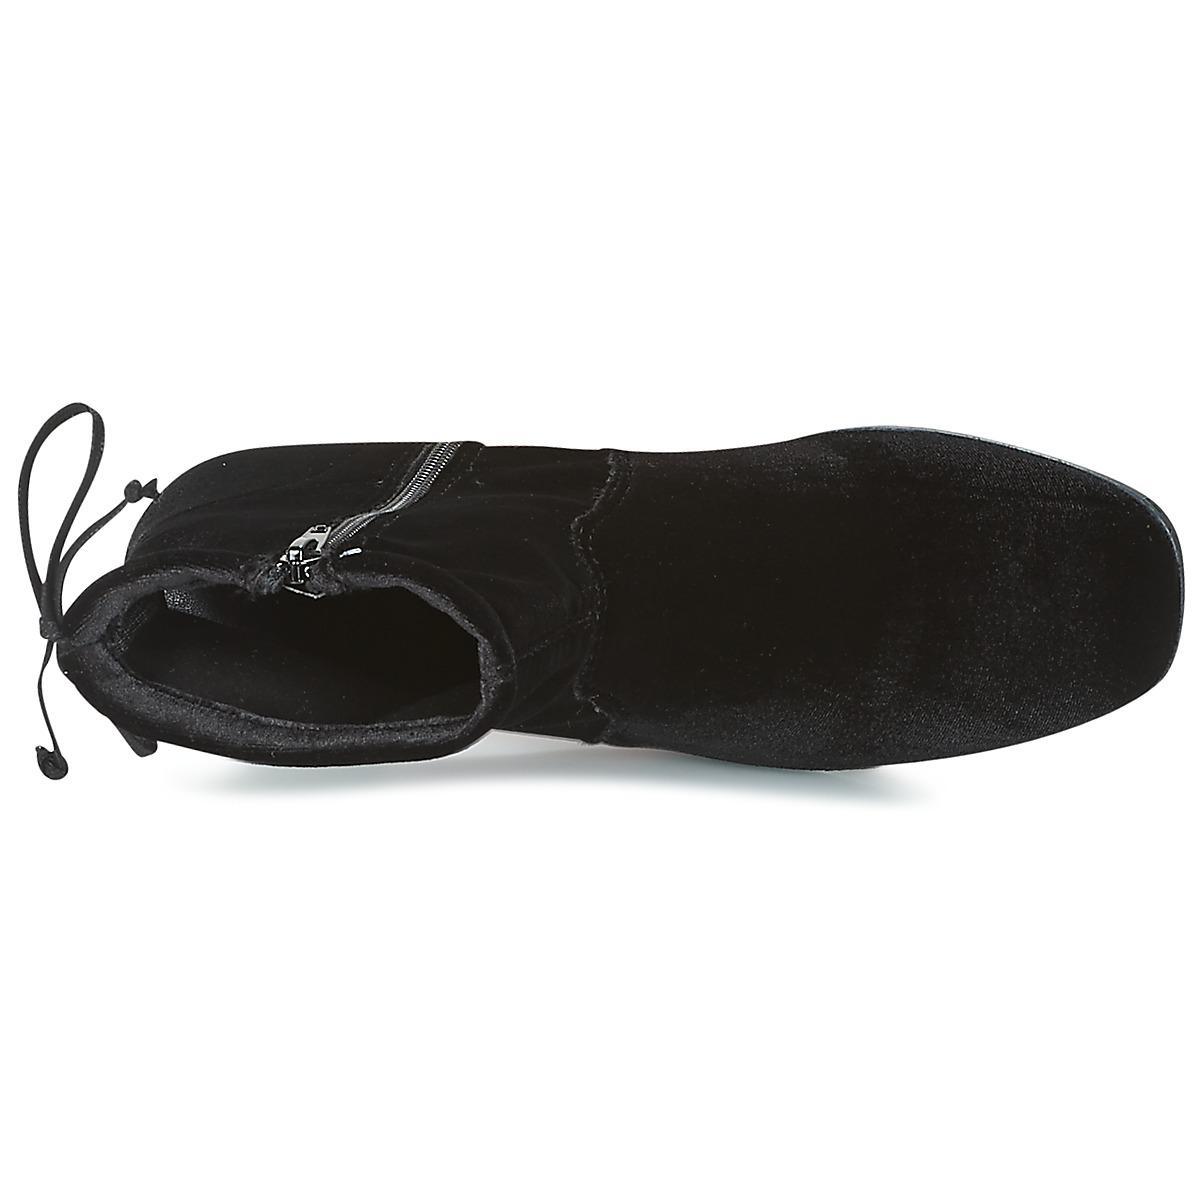 Tamaris Aris Women's Low Ankle Boots In Black